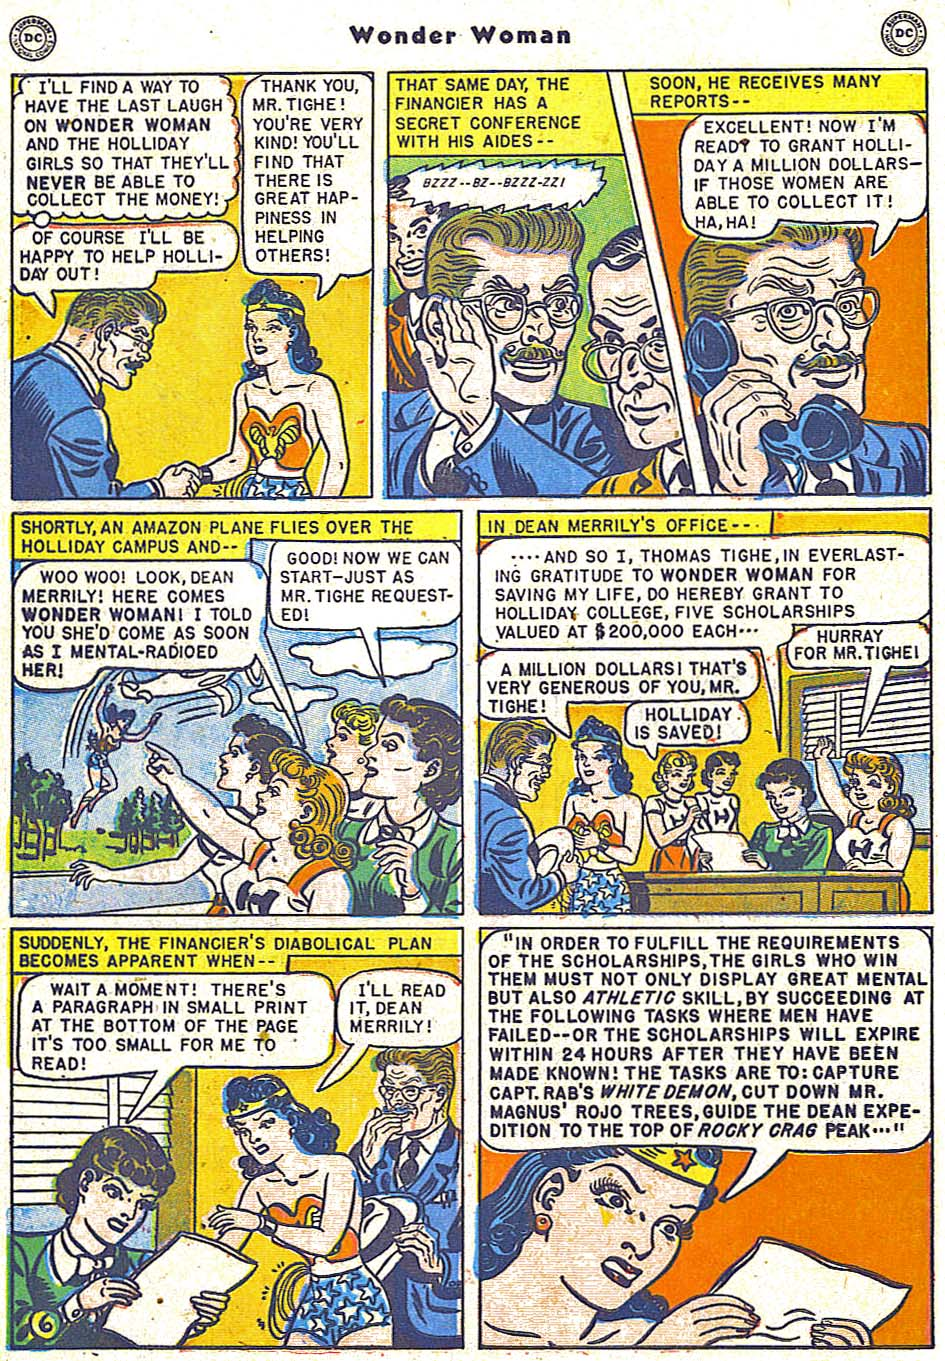 Read online Wonder Woman (1942) comic -  Issue #38 - 42